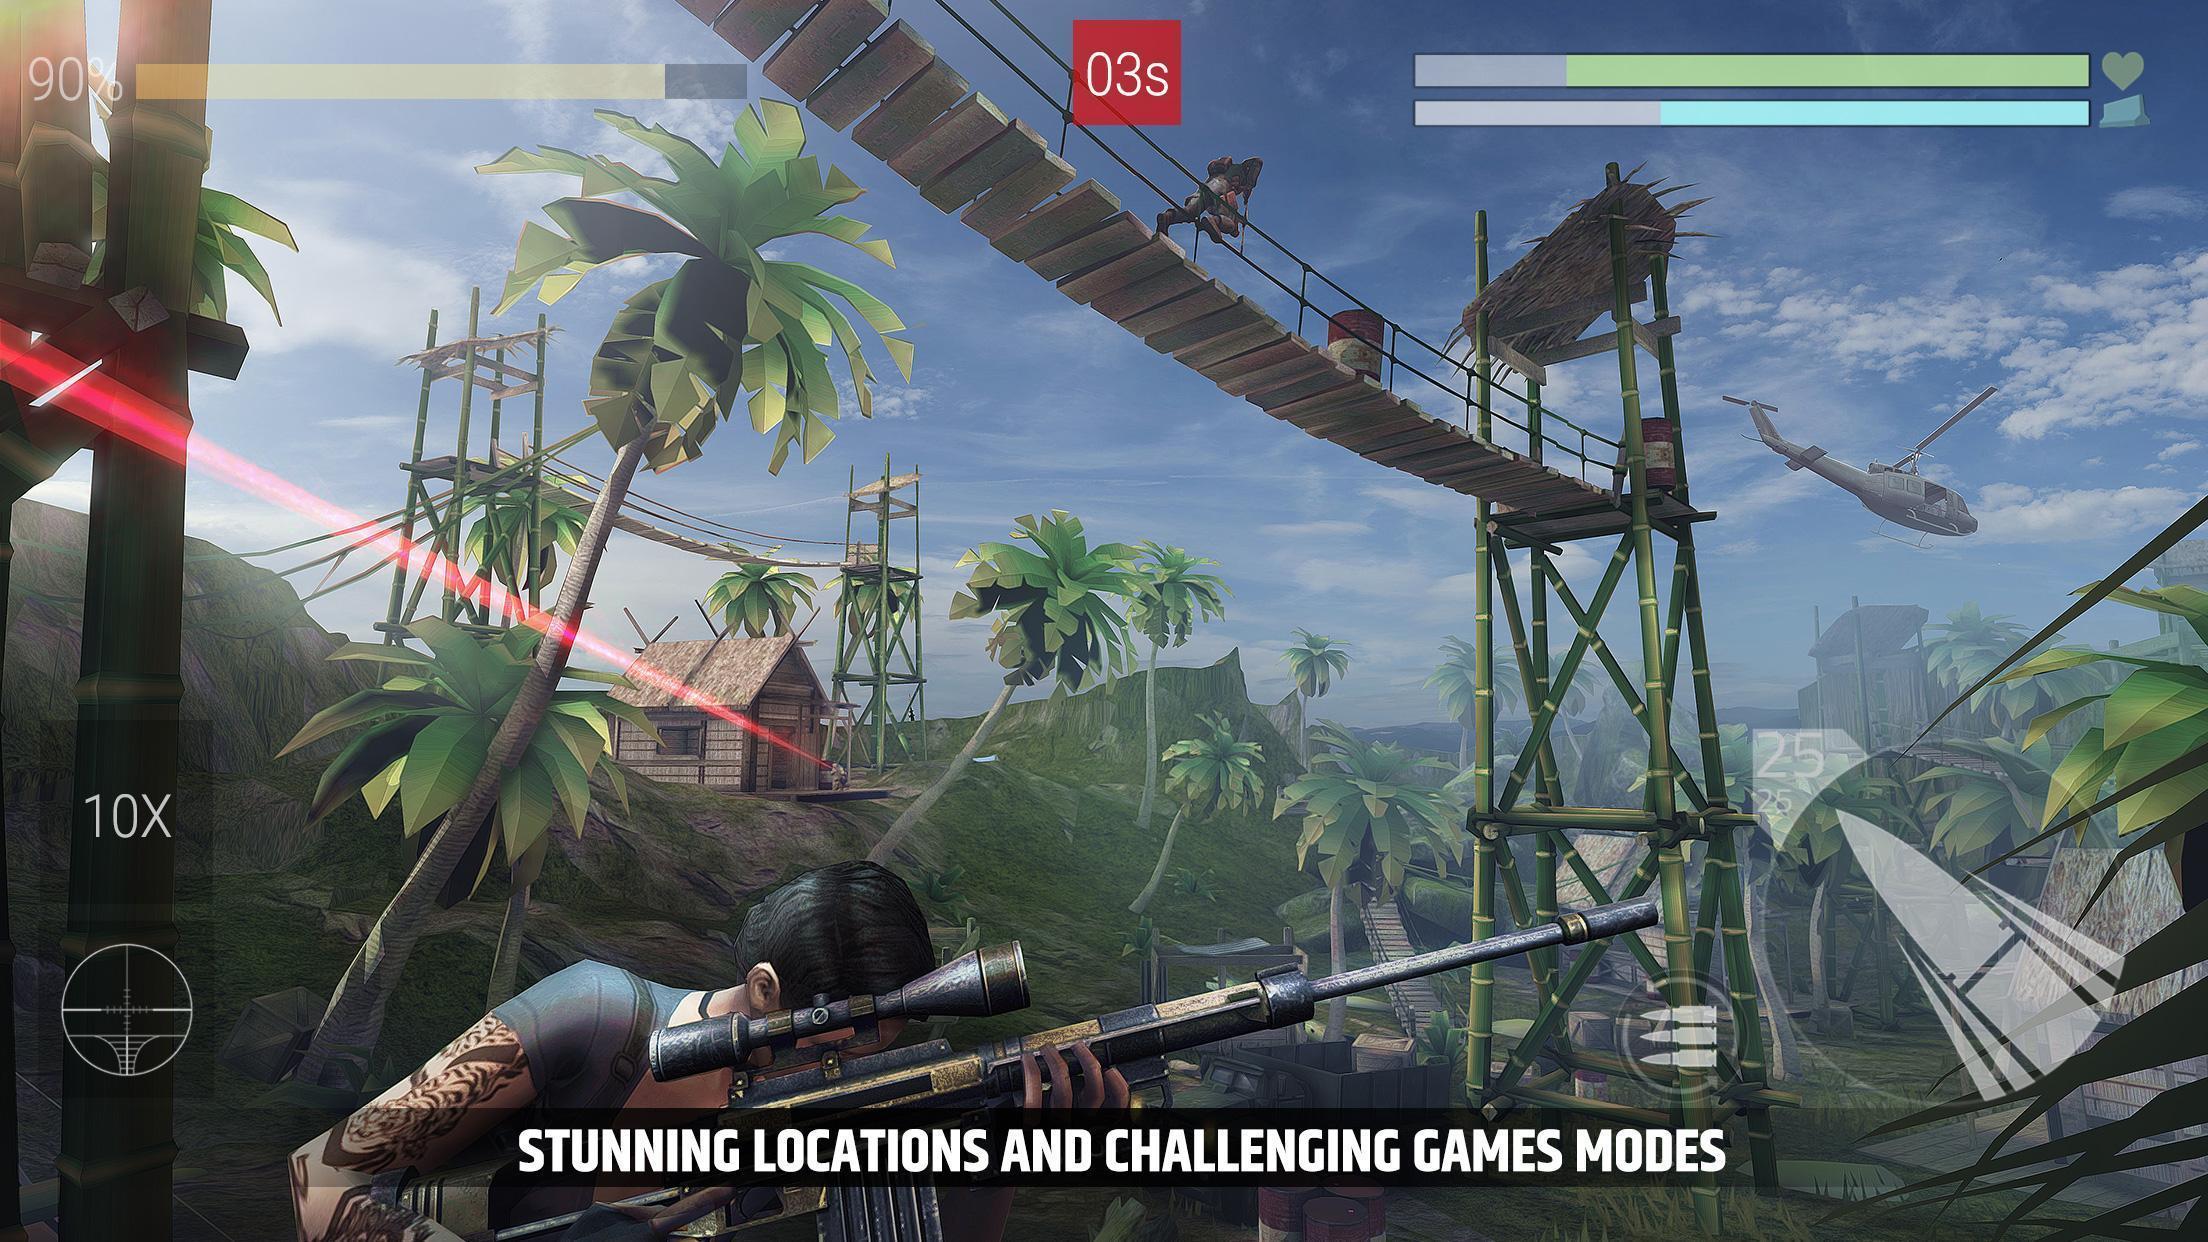 Cover Fire Offline Shooting Games 1.21.1 Screenshot 23